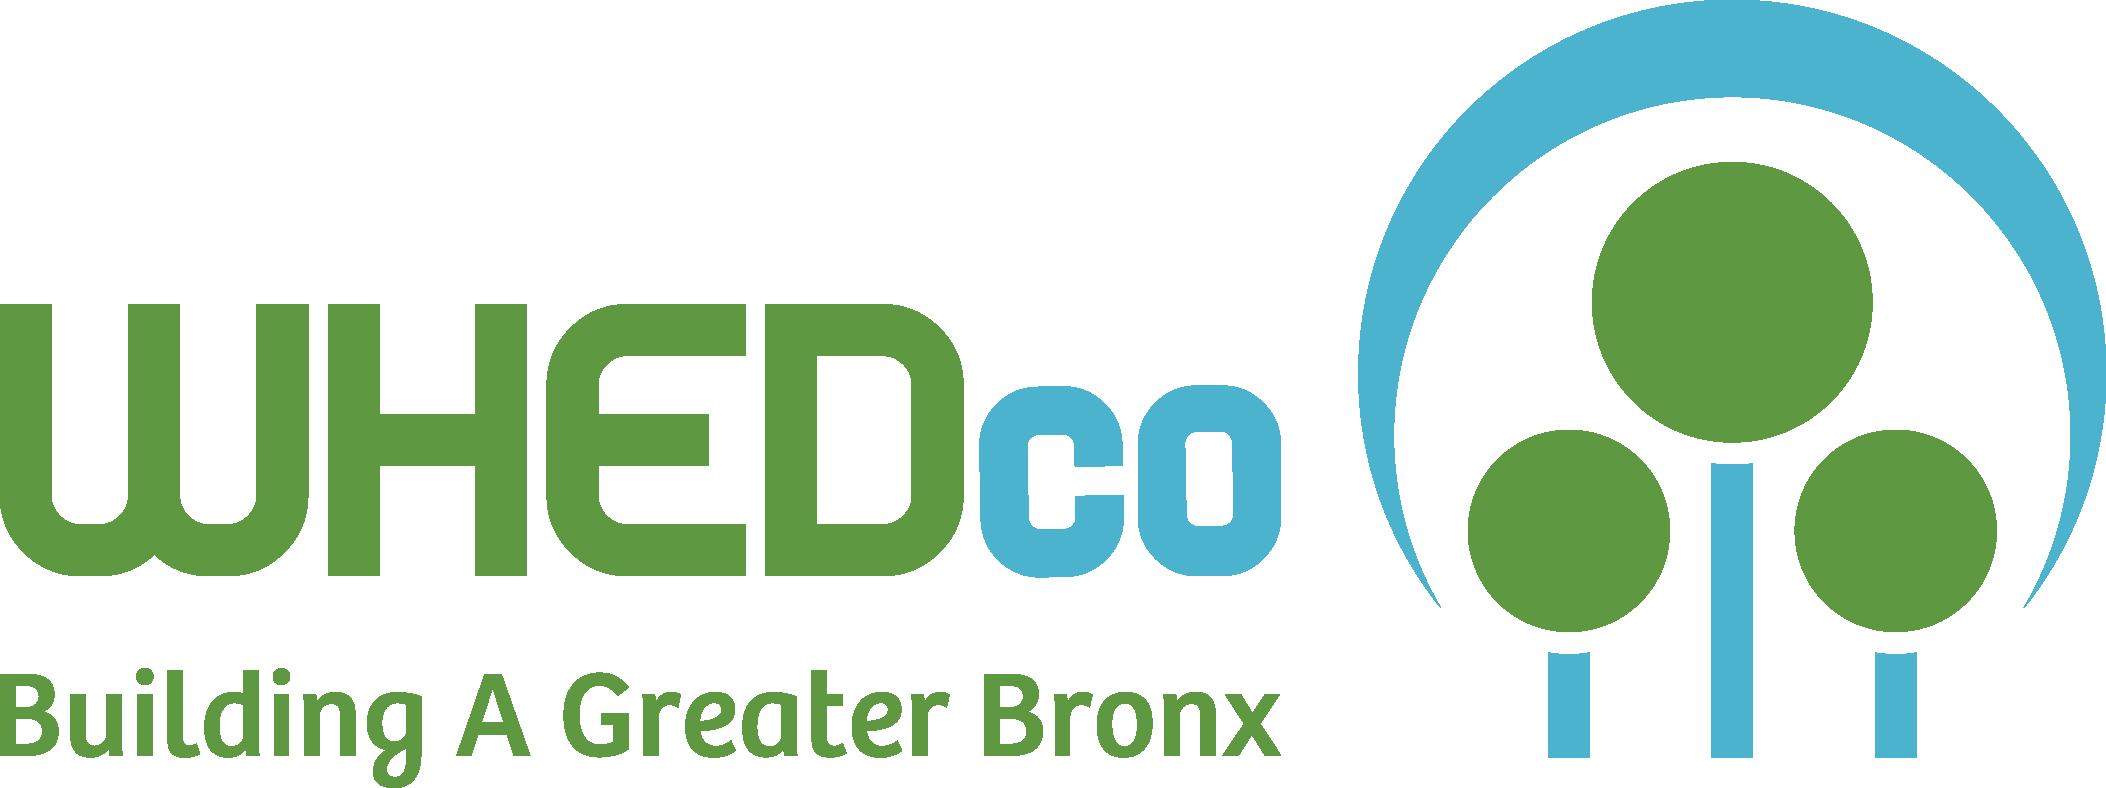 WHEDco horizontal logo